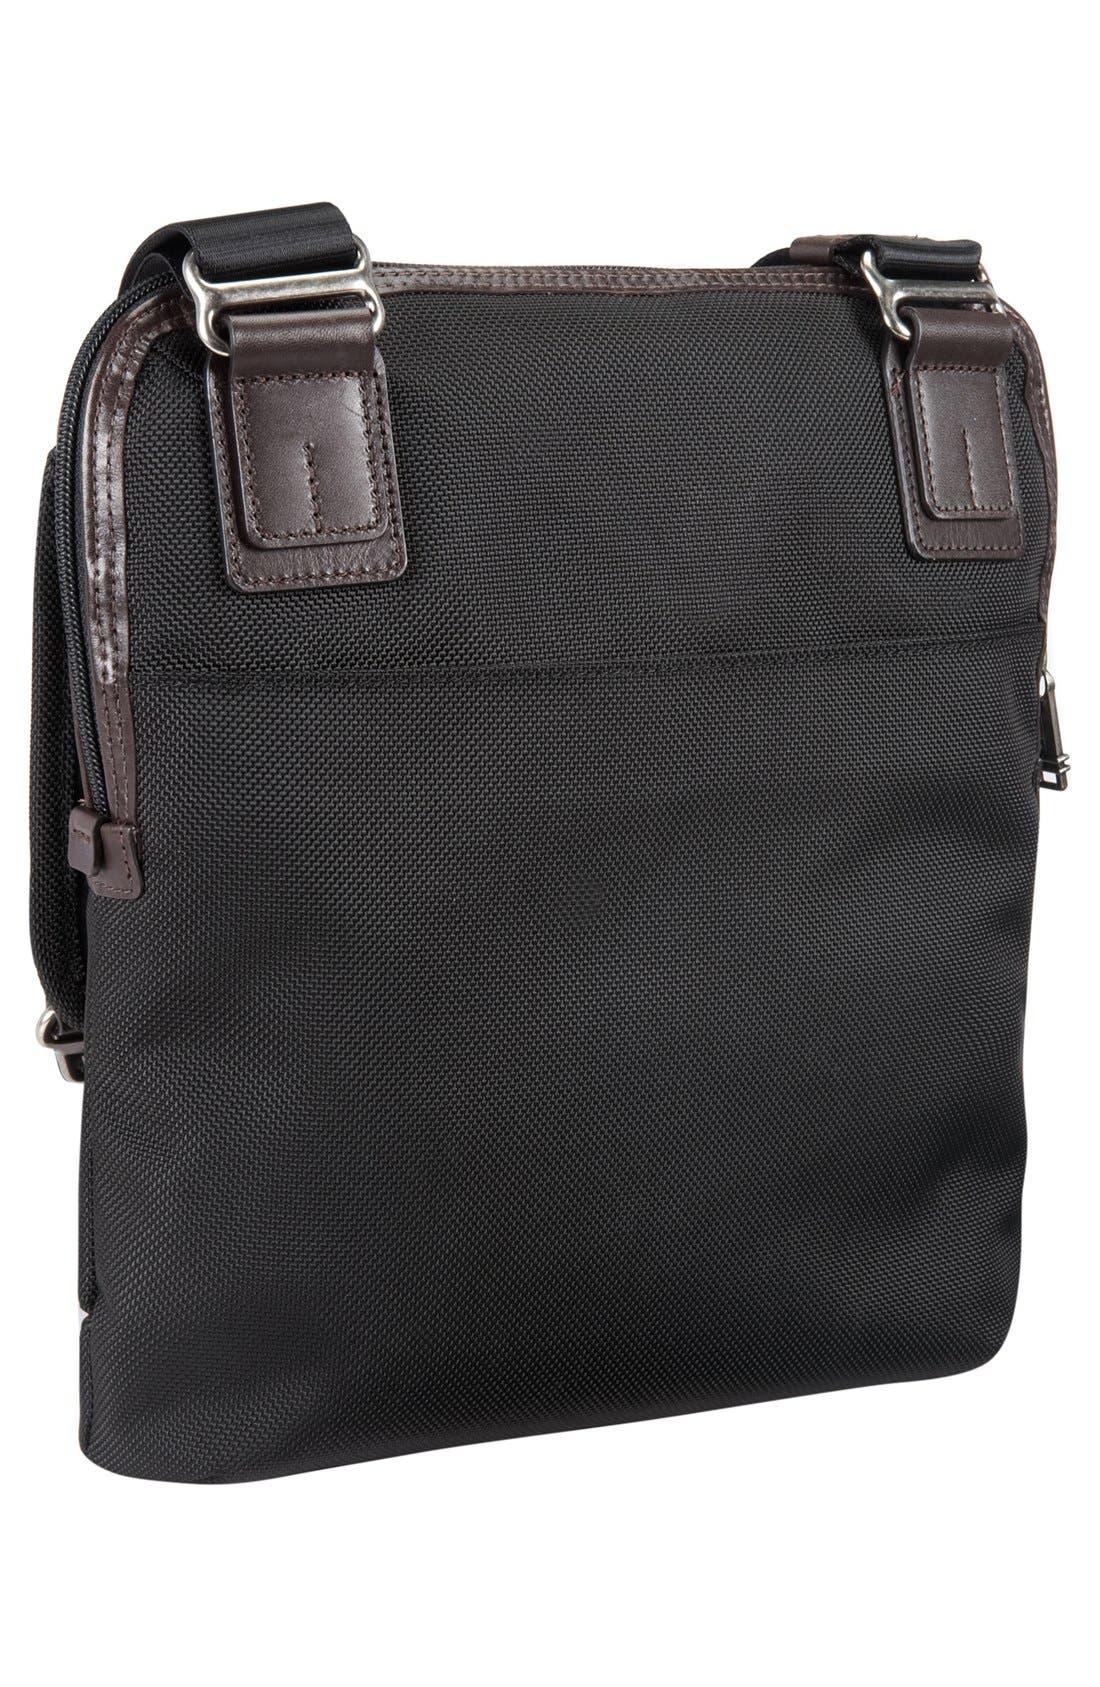 TUMI,                             'Alpha Bravo - Annapolis' Zip Flap Messenger Bag,                             Alternate thumbnail 4, color,                             001